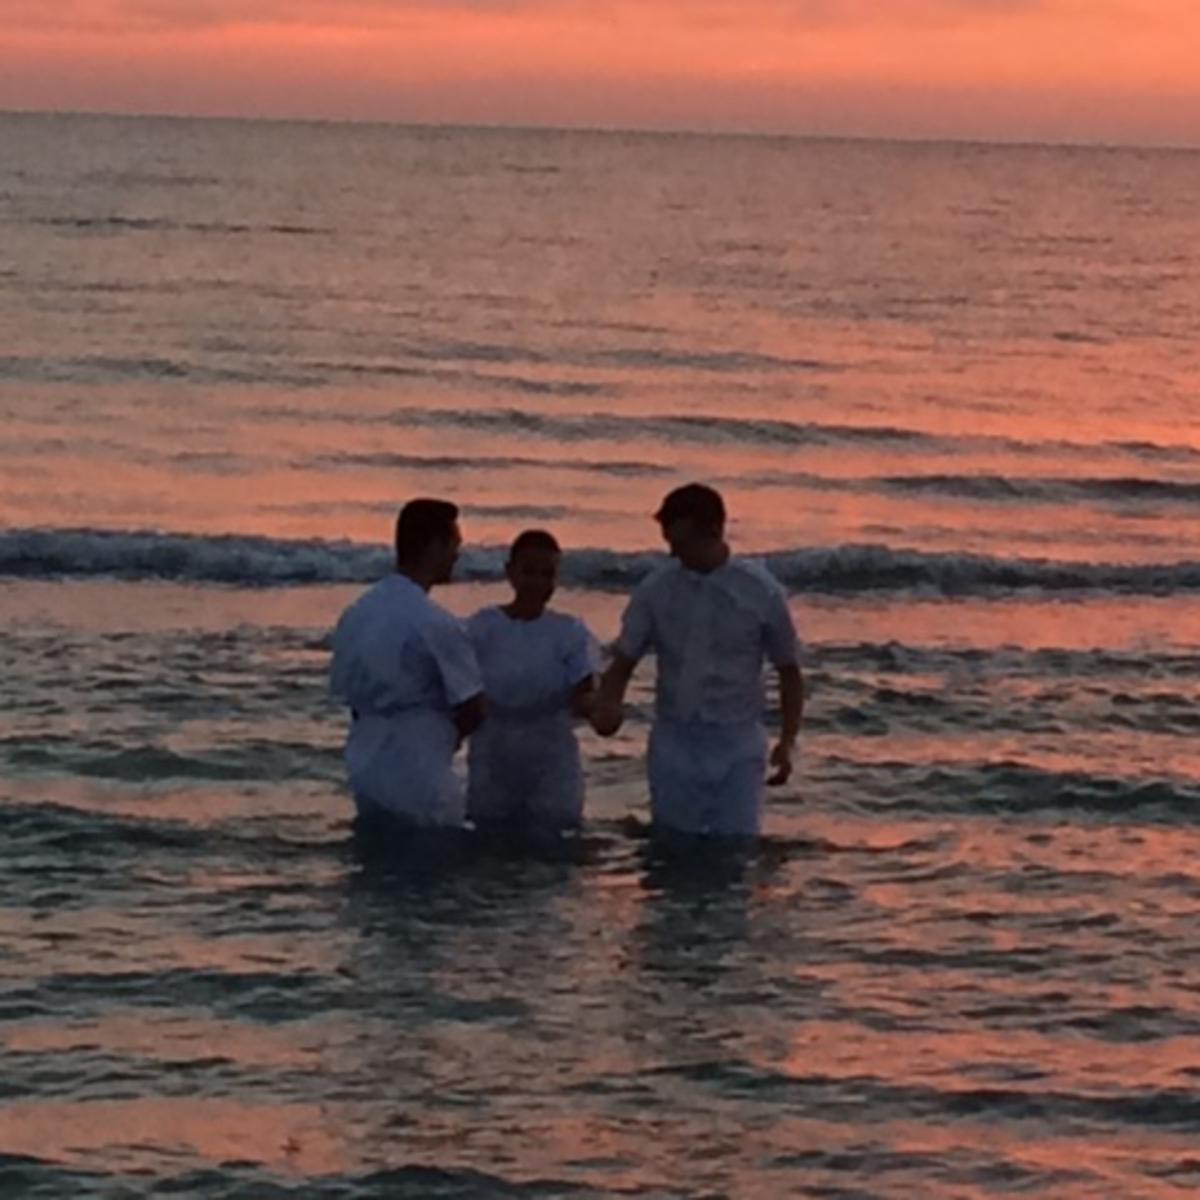 Taufe im Meer